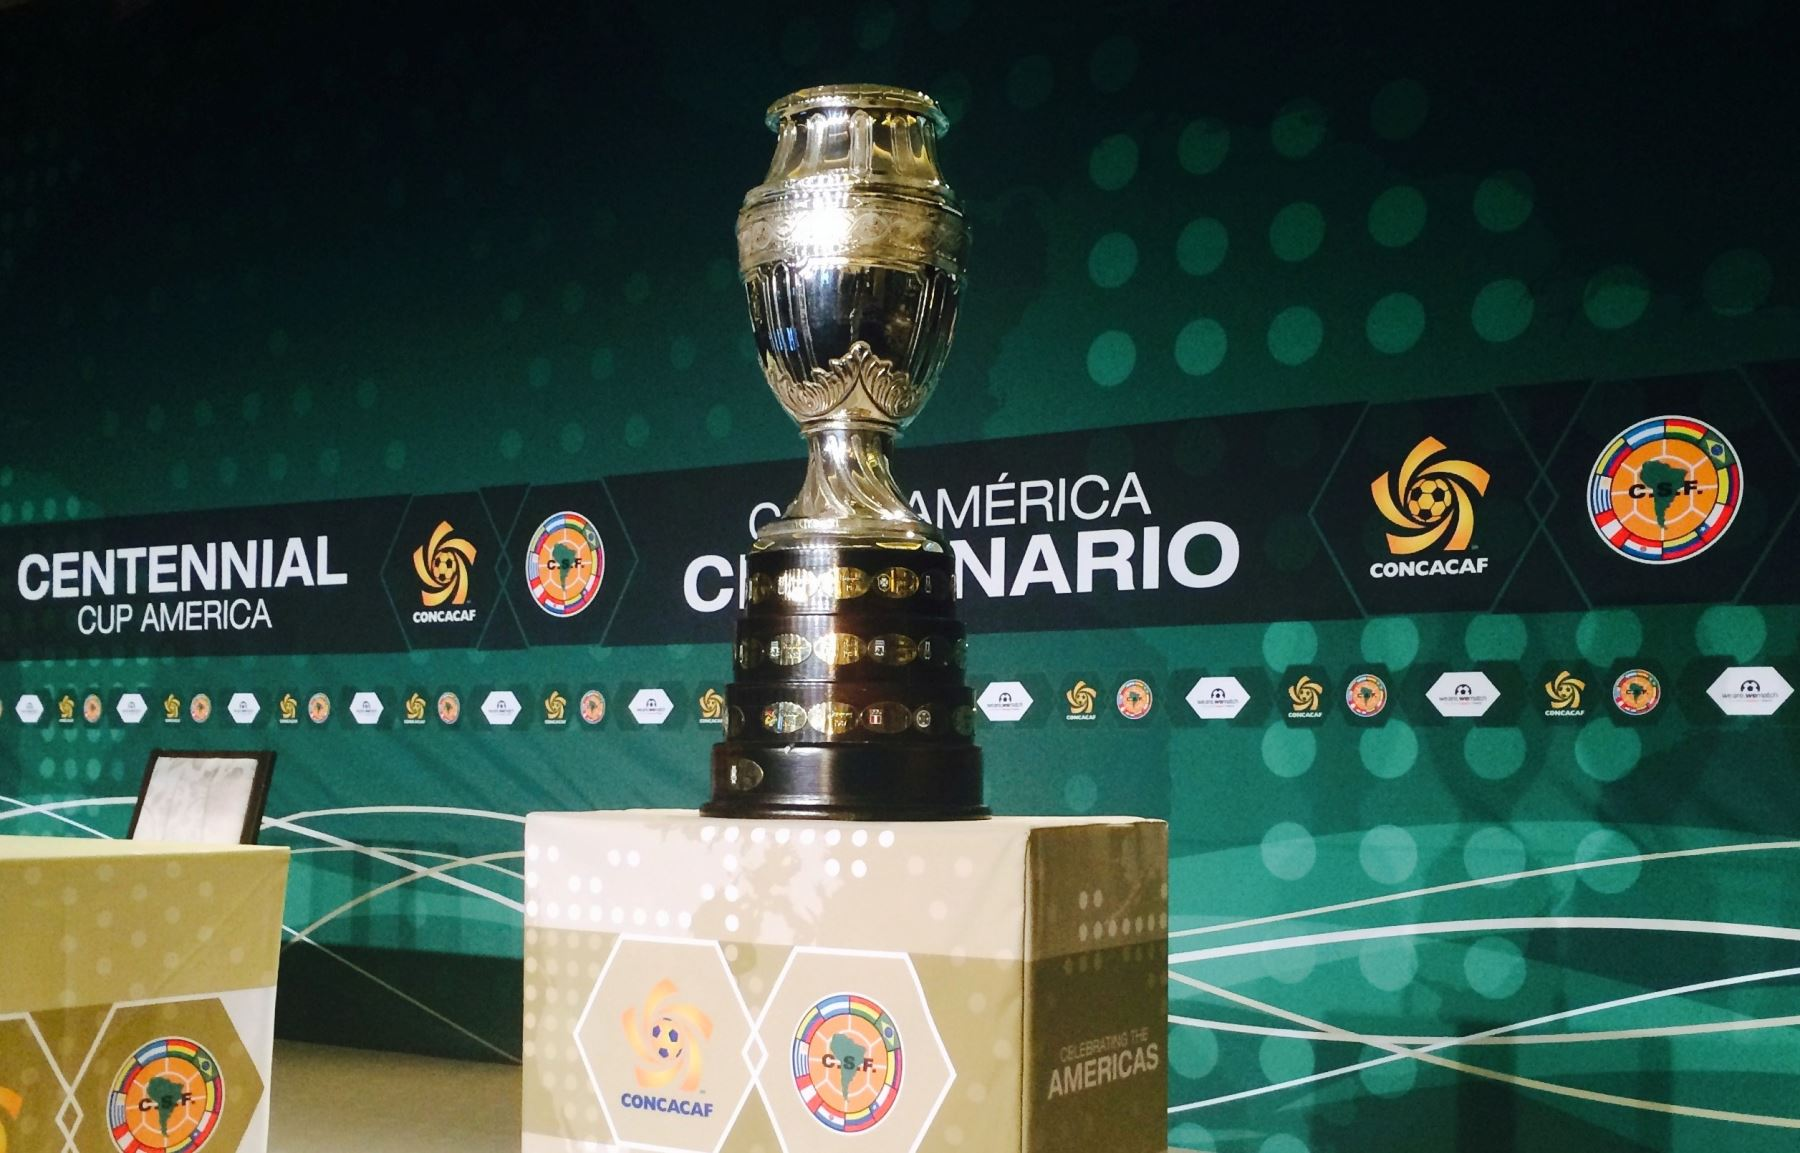 2016 copa america tournament to be held in ten us cities